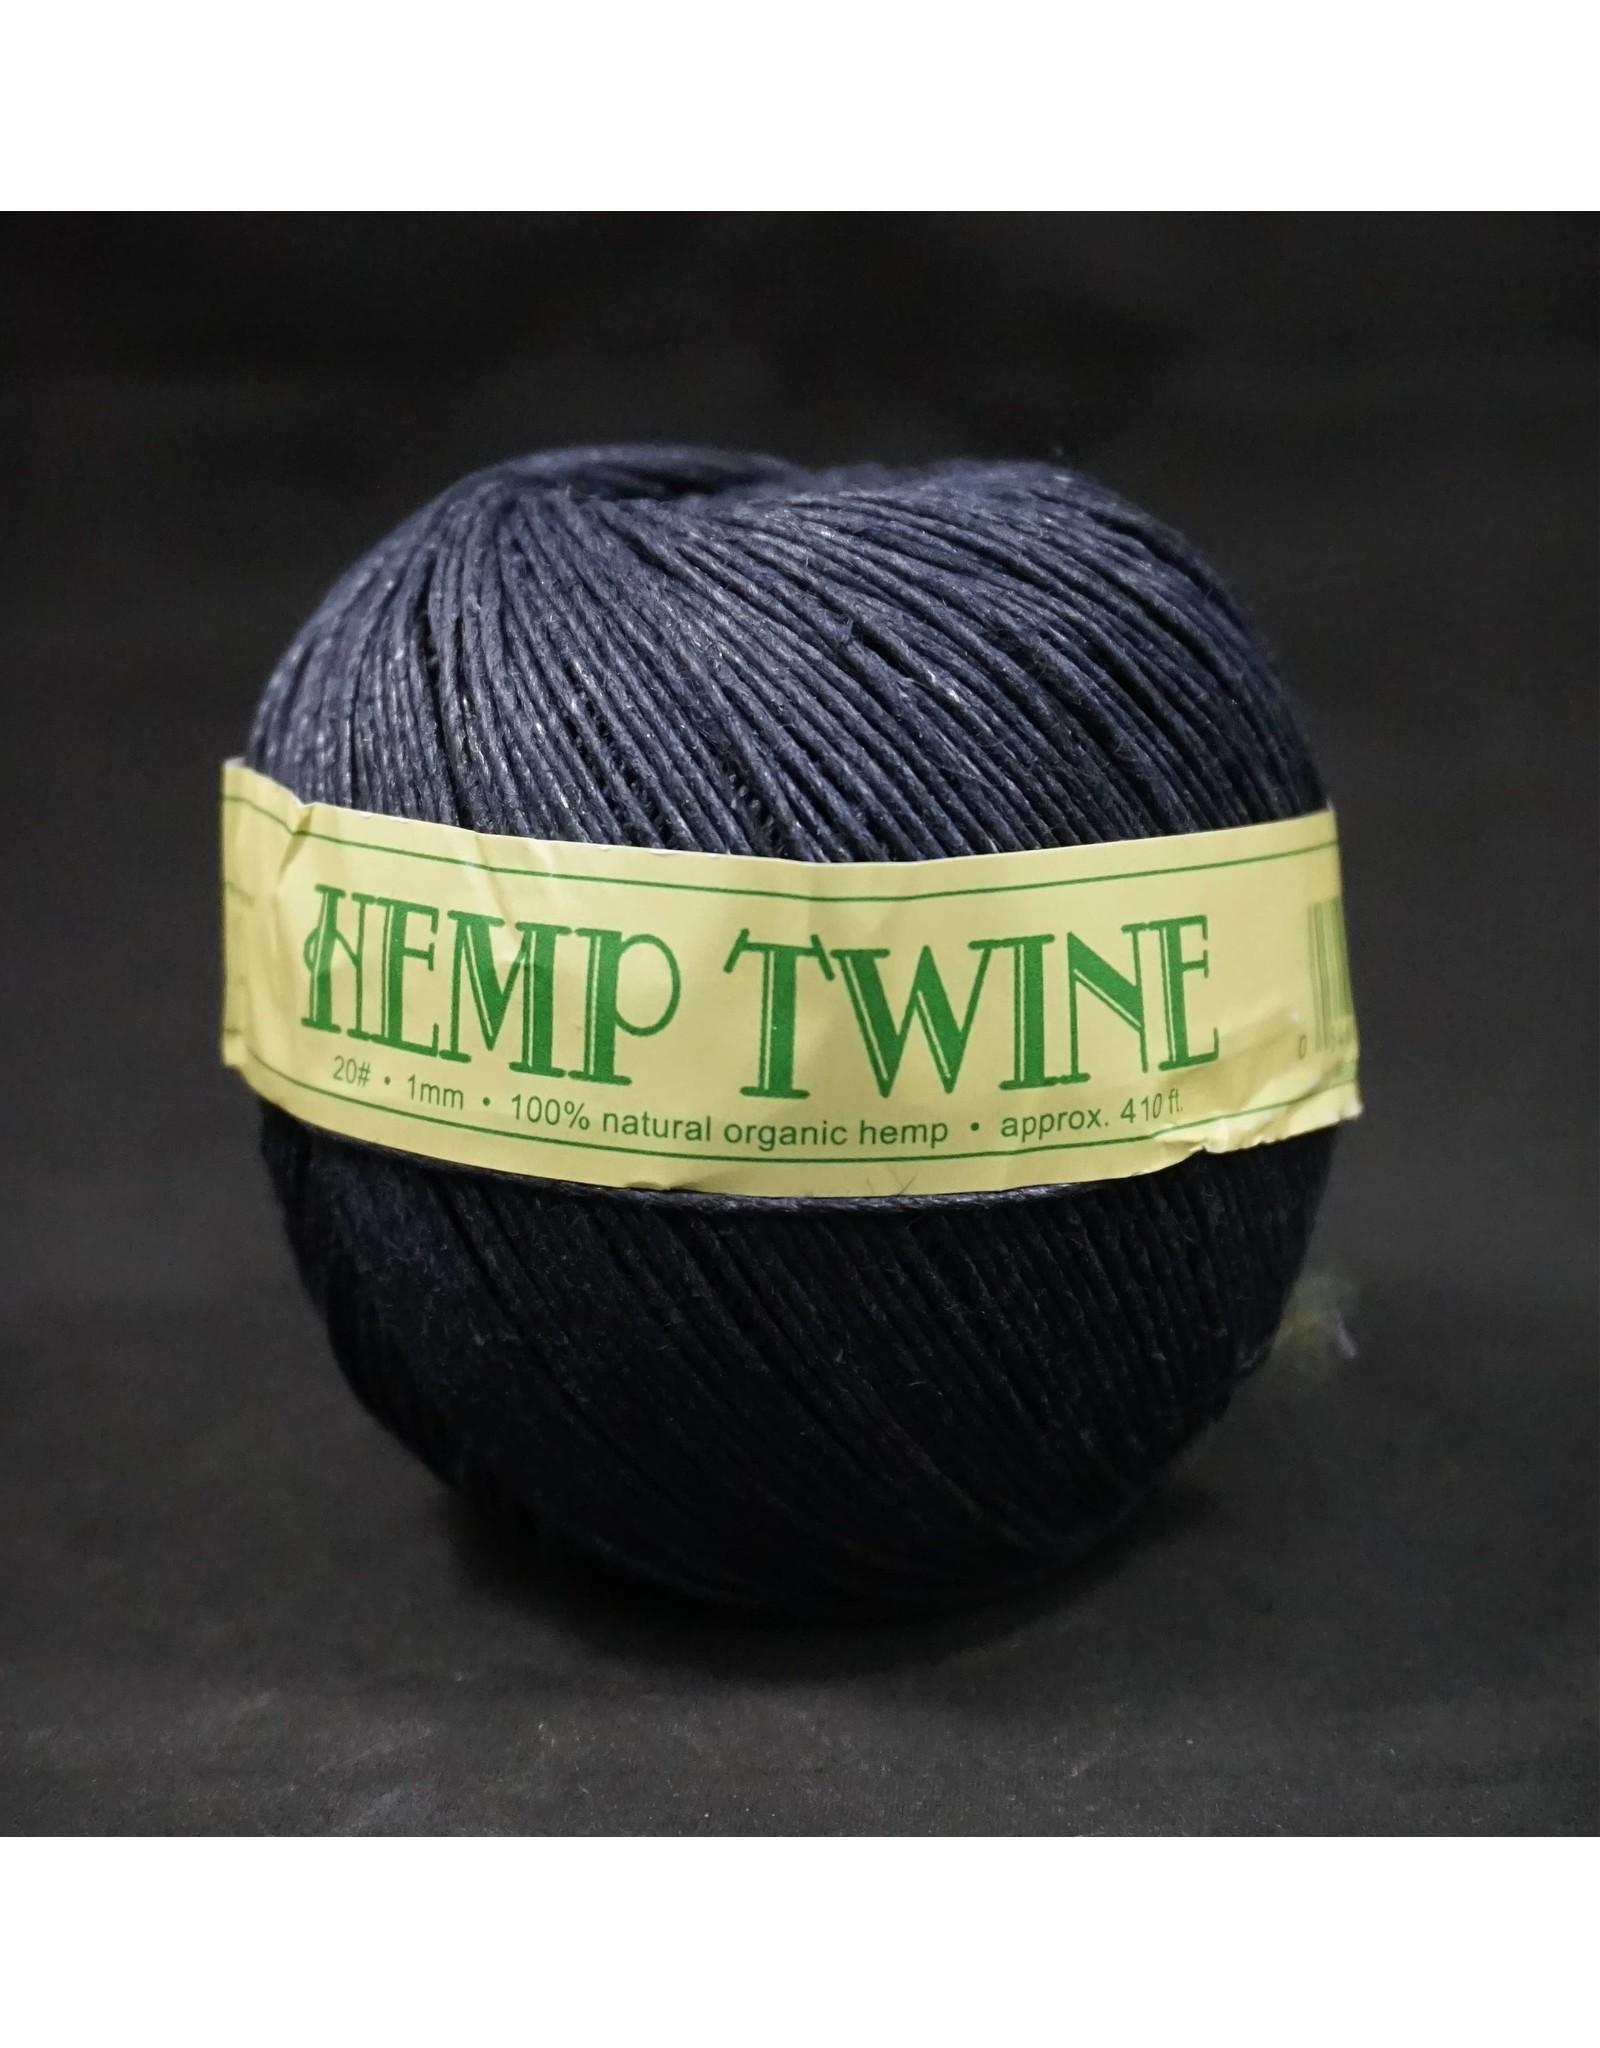 Dark Blue Hemp Twine 1mm 100g